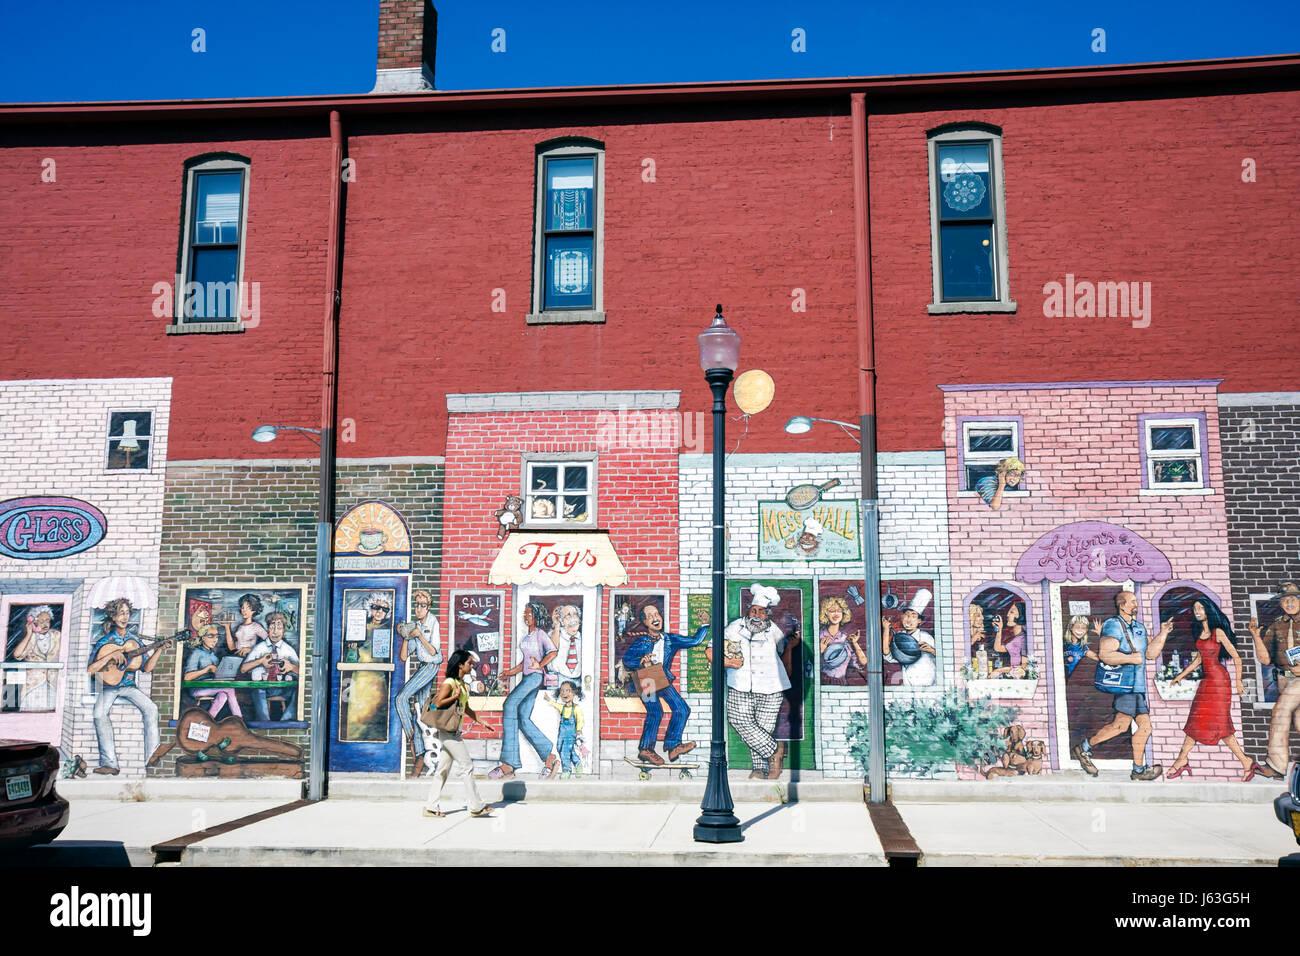 j 8 street latina - photo#25